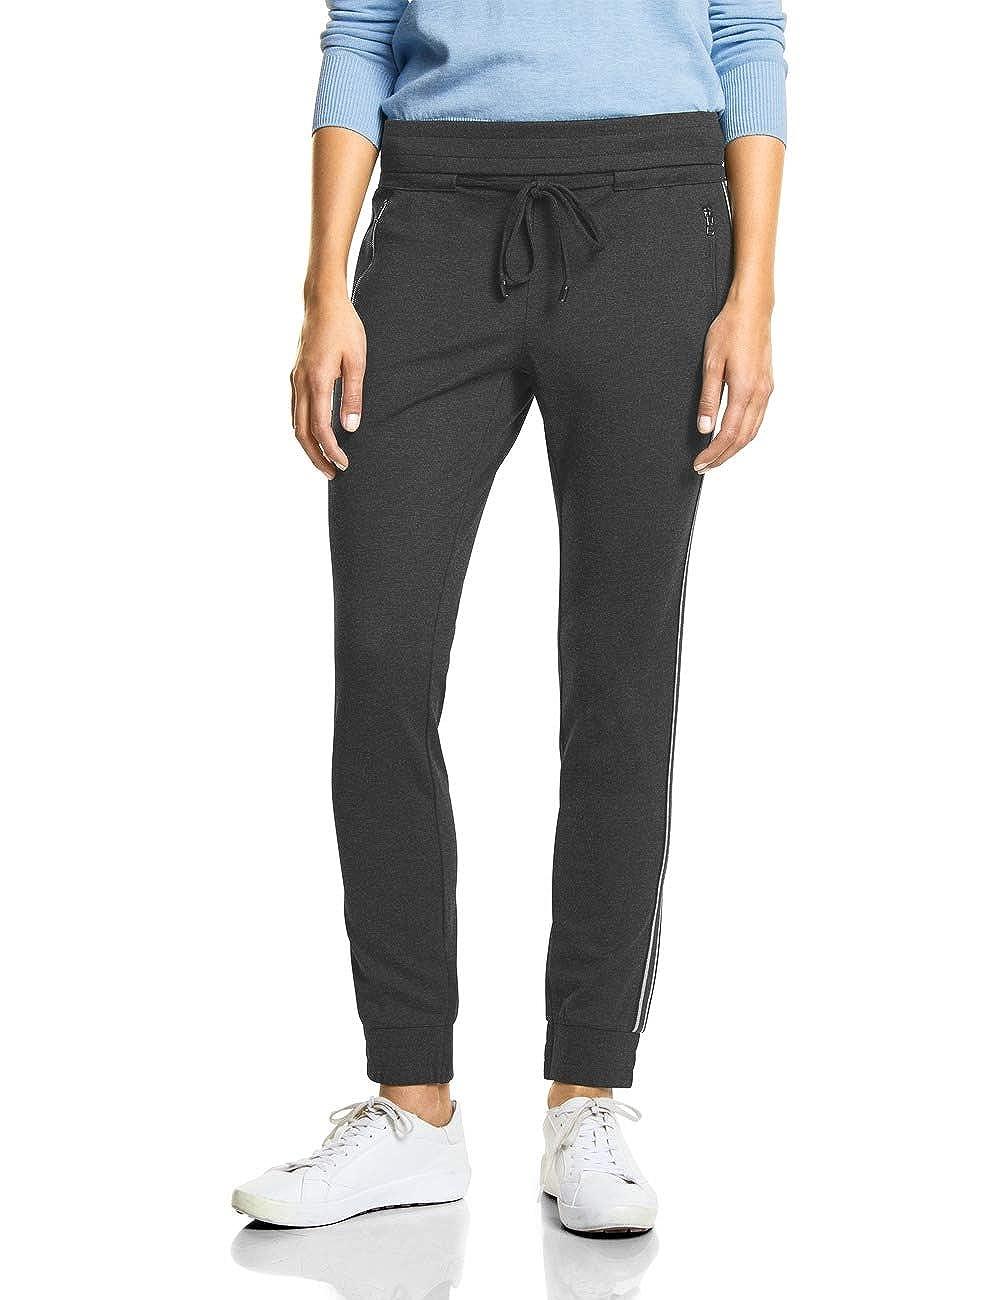 TALLA 32W / 30L. Street One Pantalones para Mujer